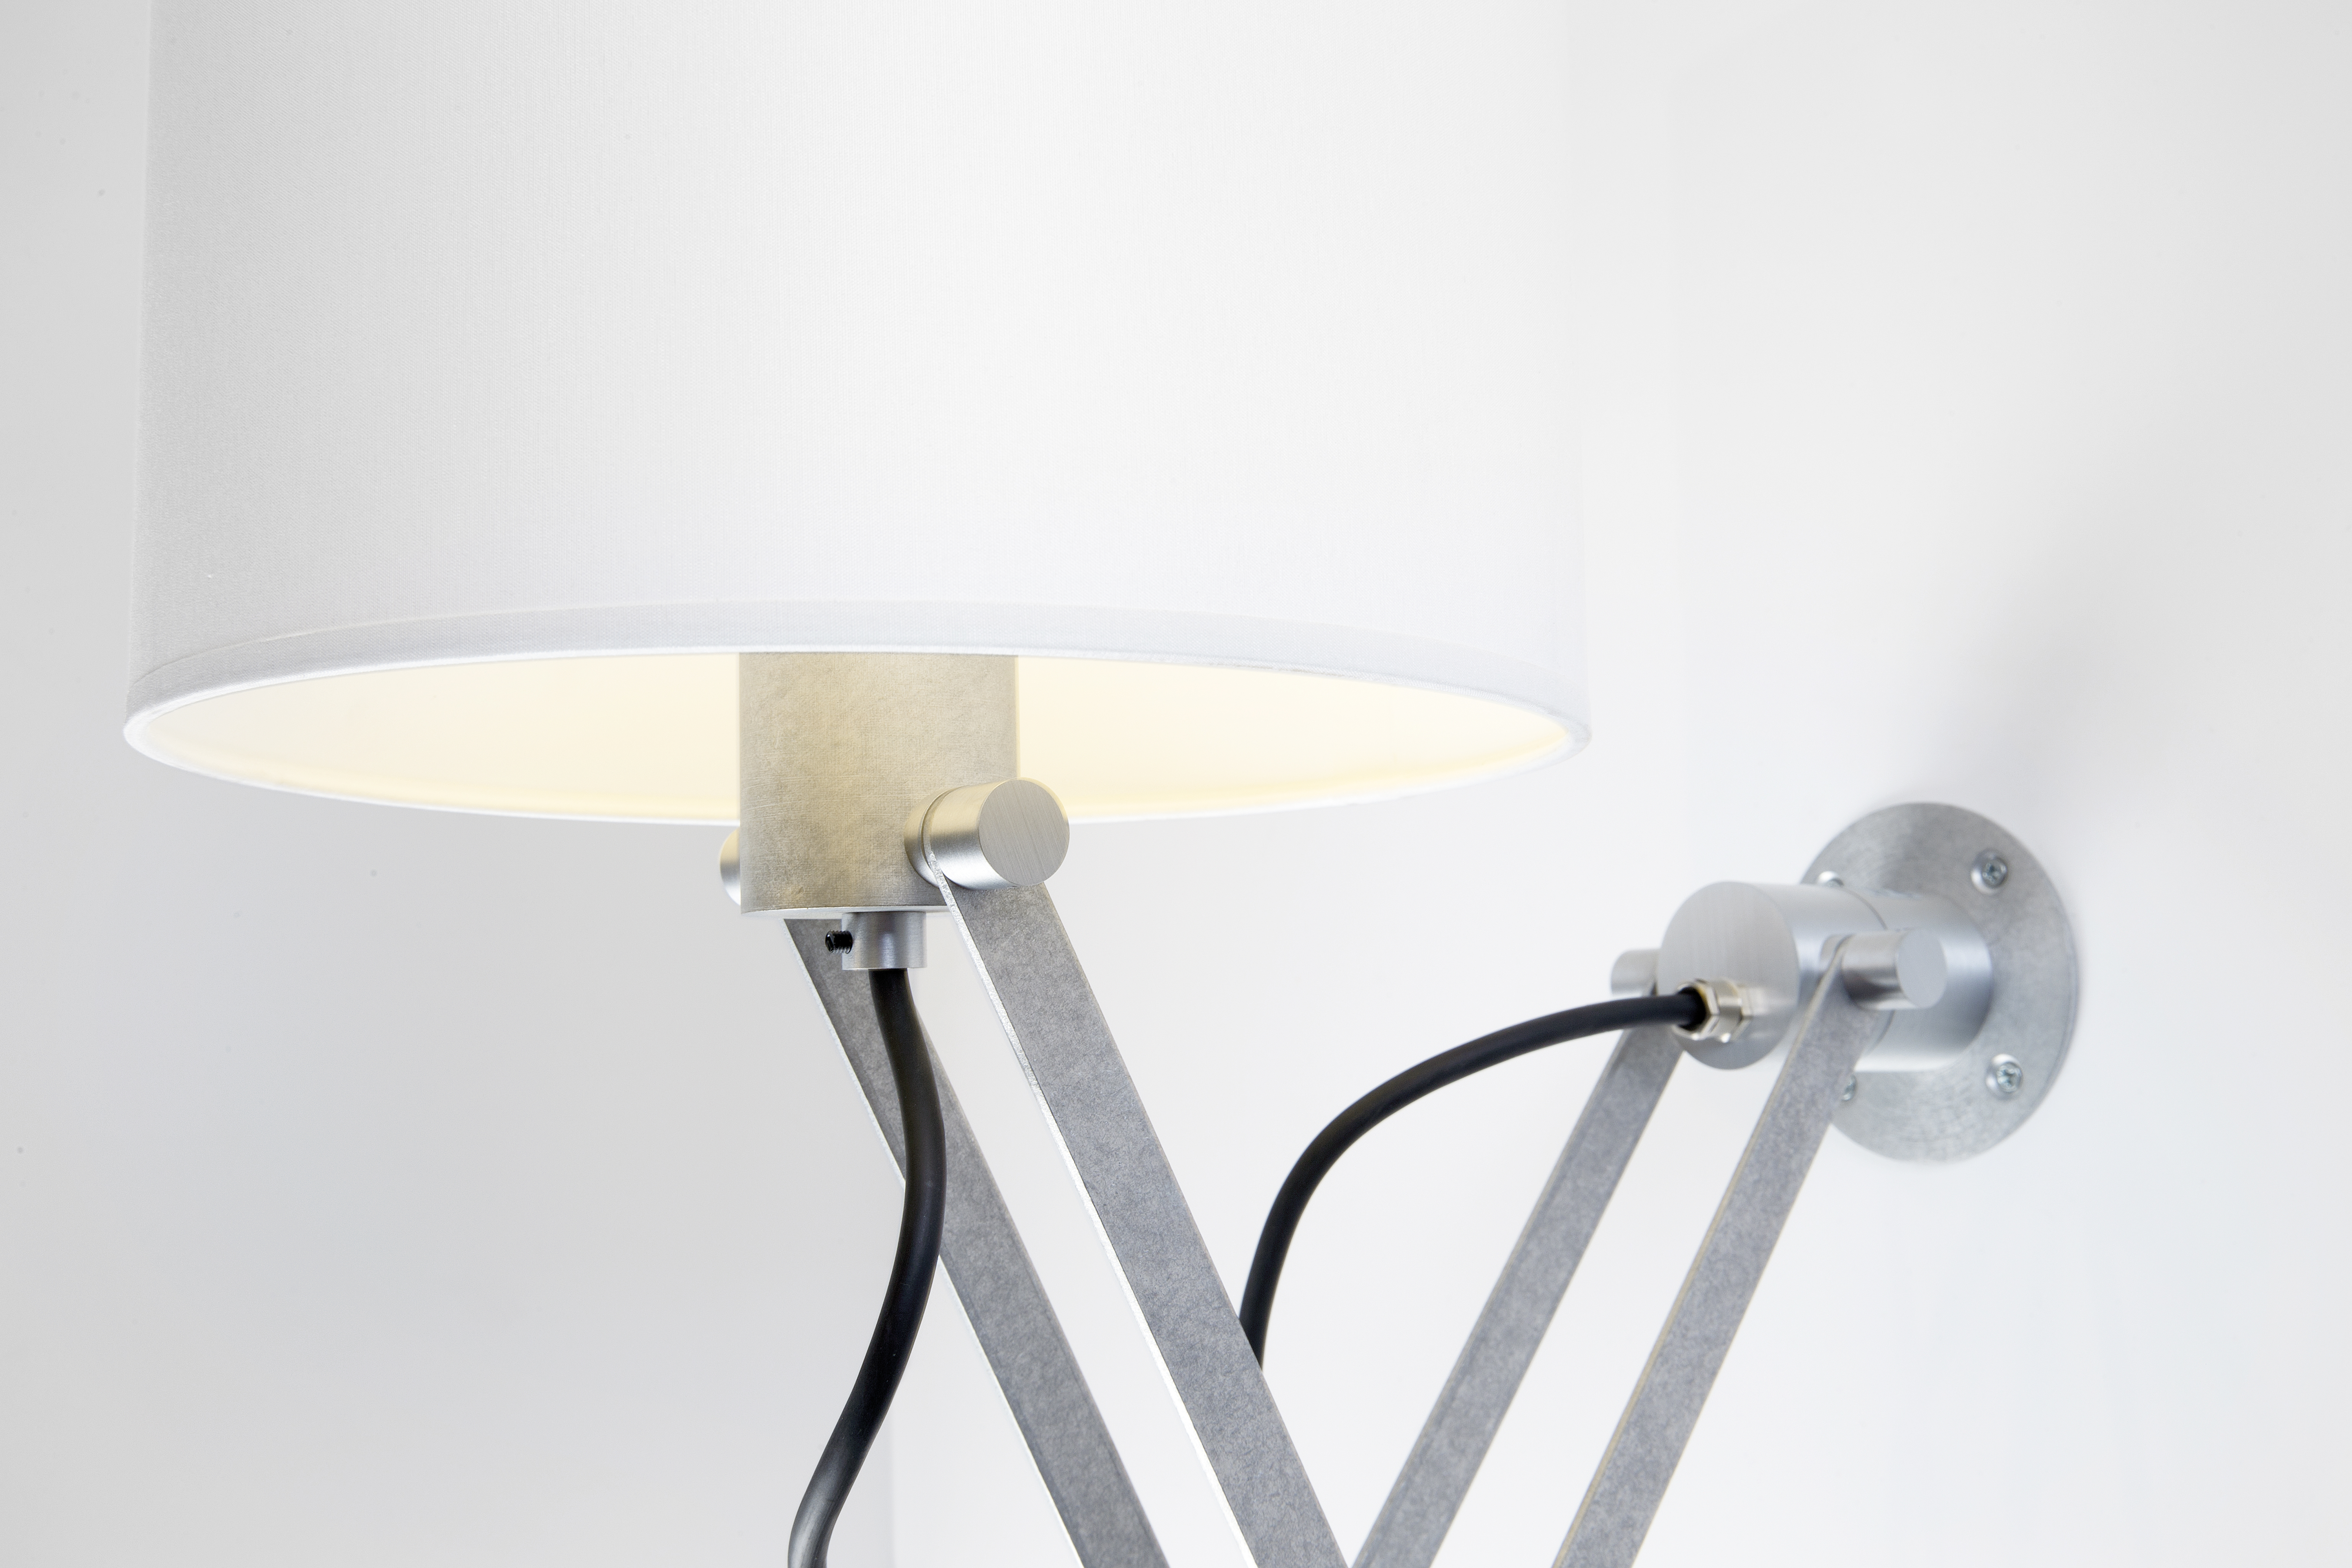 Modular Nomad Lamp : Nomad minimal by modular lighting instruments stylepark